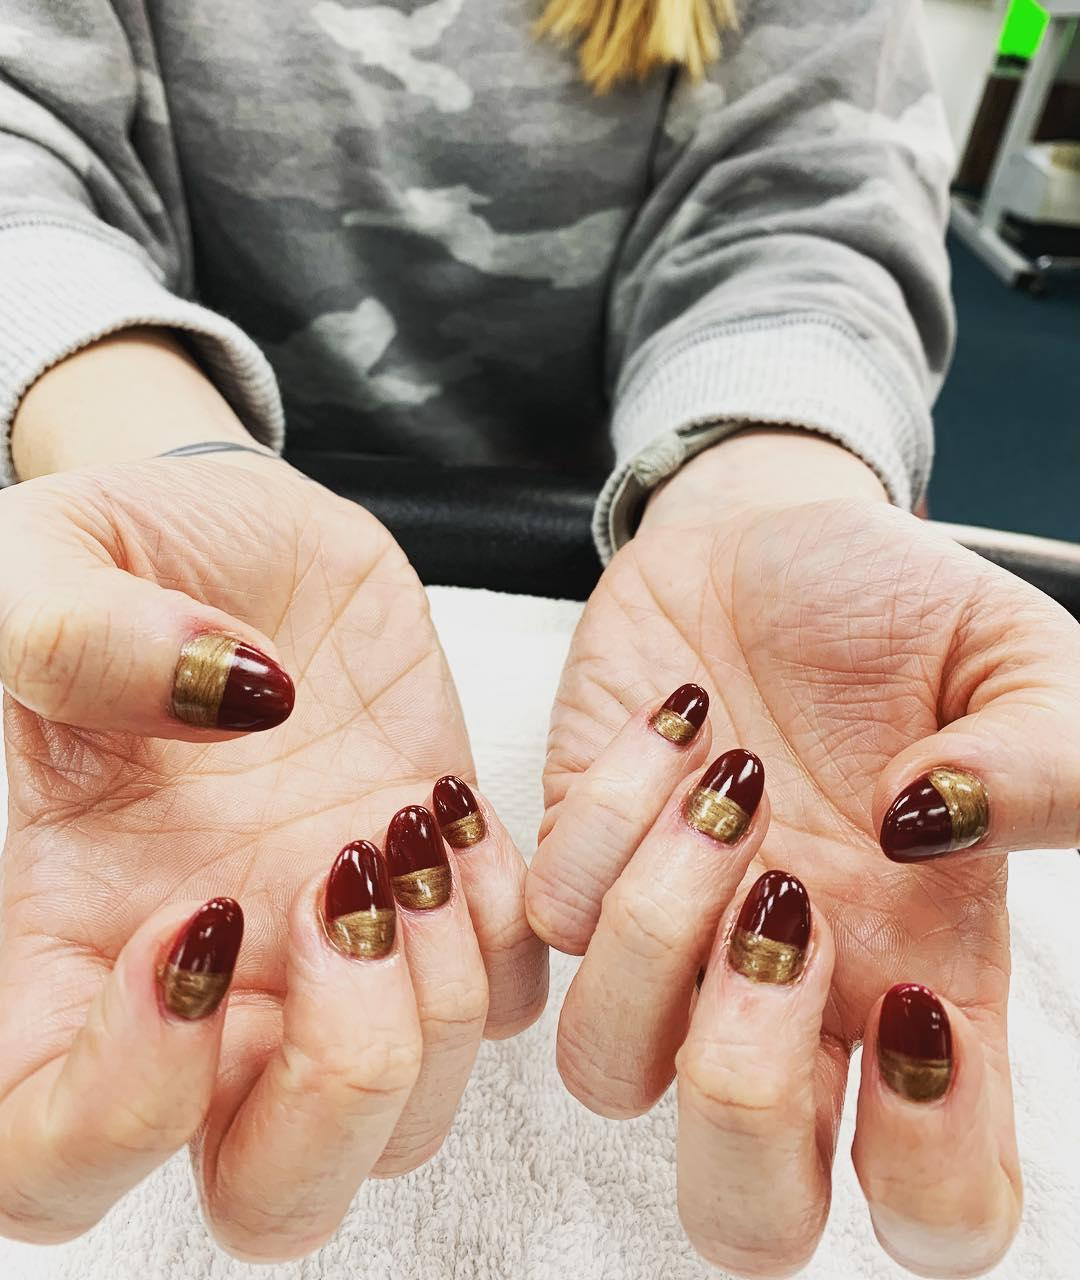 simple flower nail design ideas 2019 11 - 24 Simple Flower Nail Design Ideas 2019